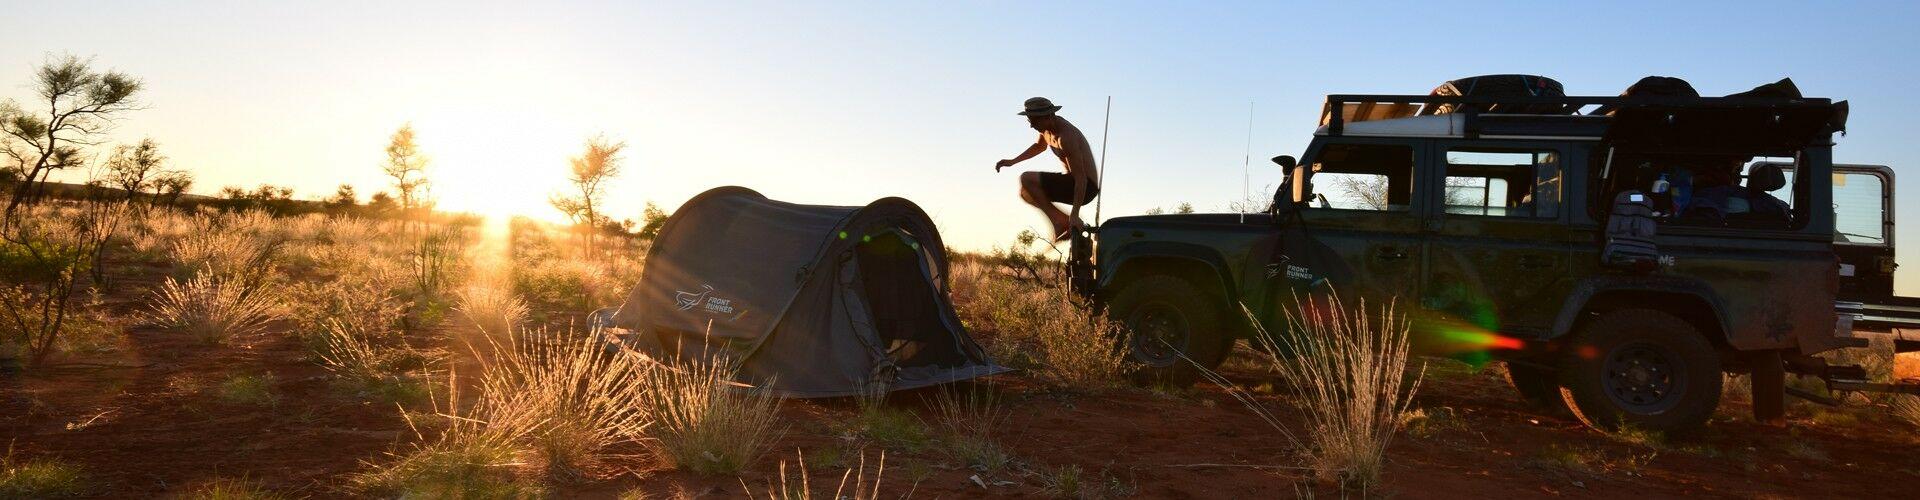 FRONT RUNNER | Off-Road Tough Roof Racks & Vehicle Adventure